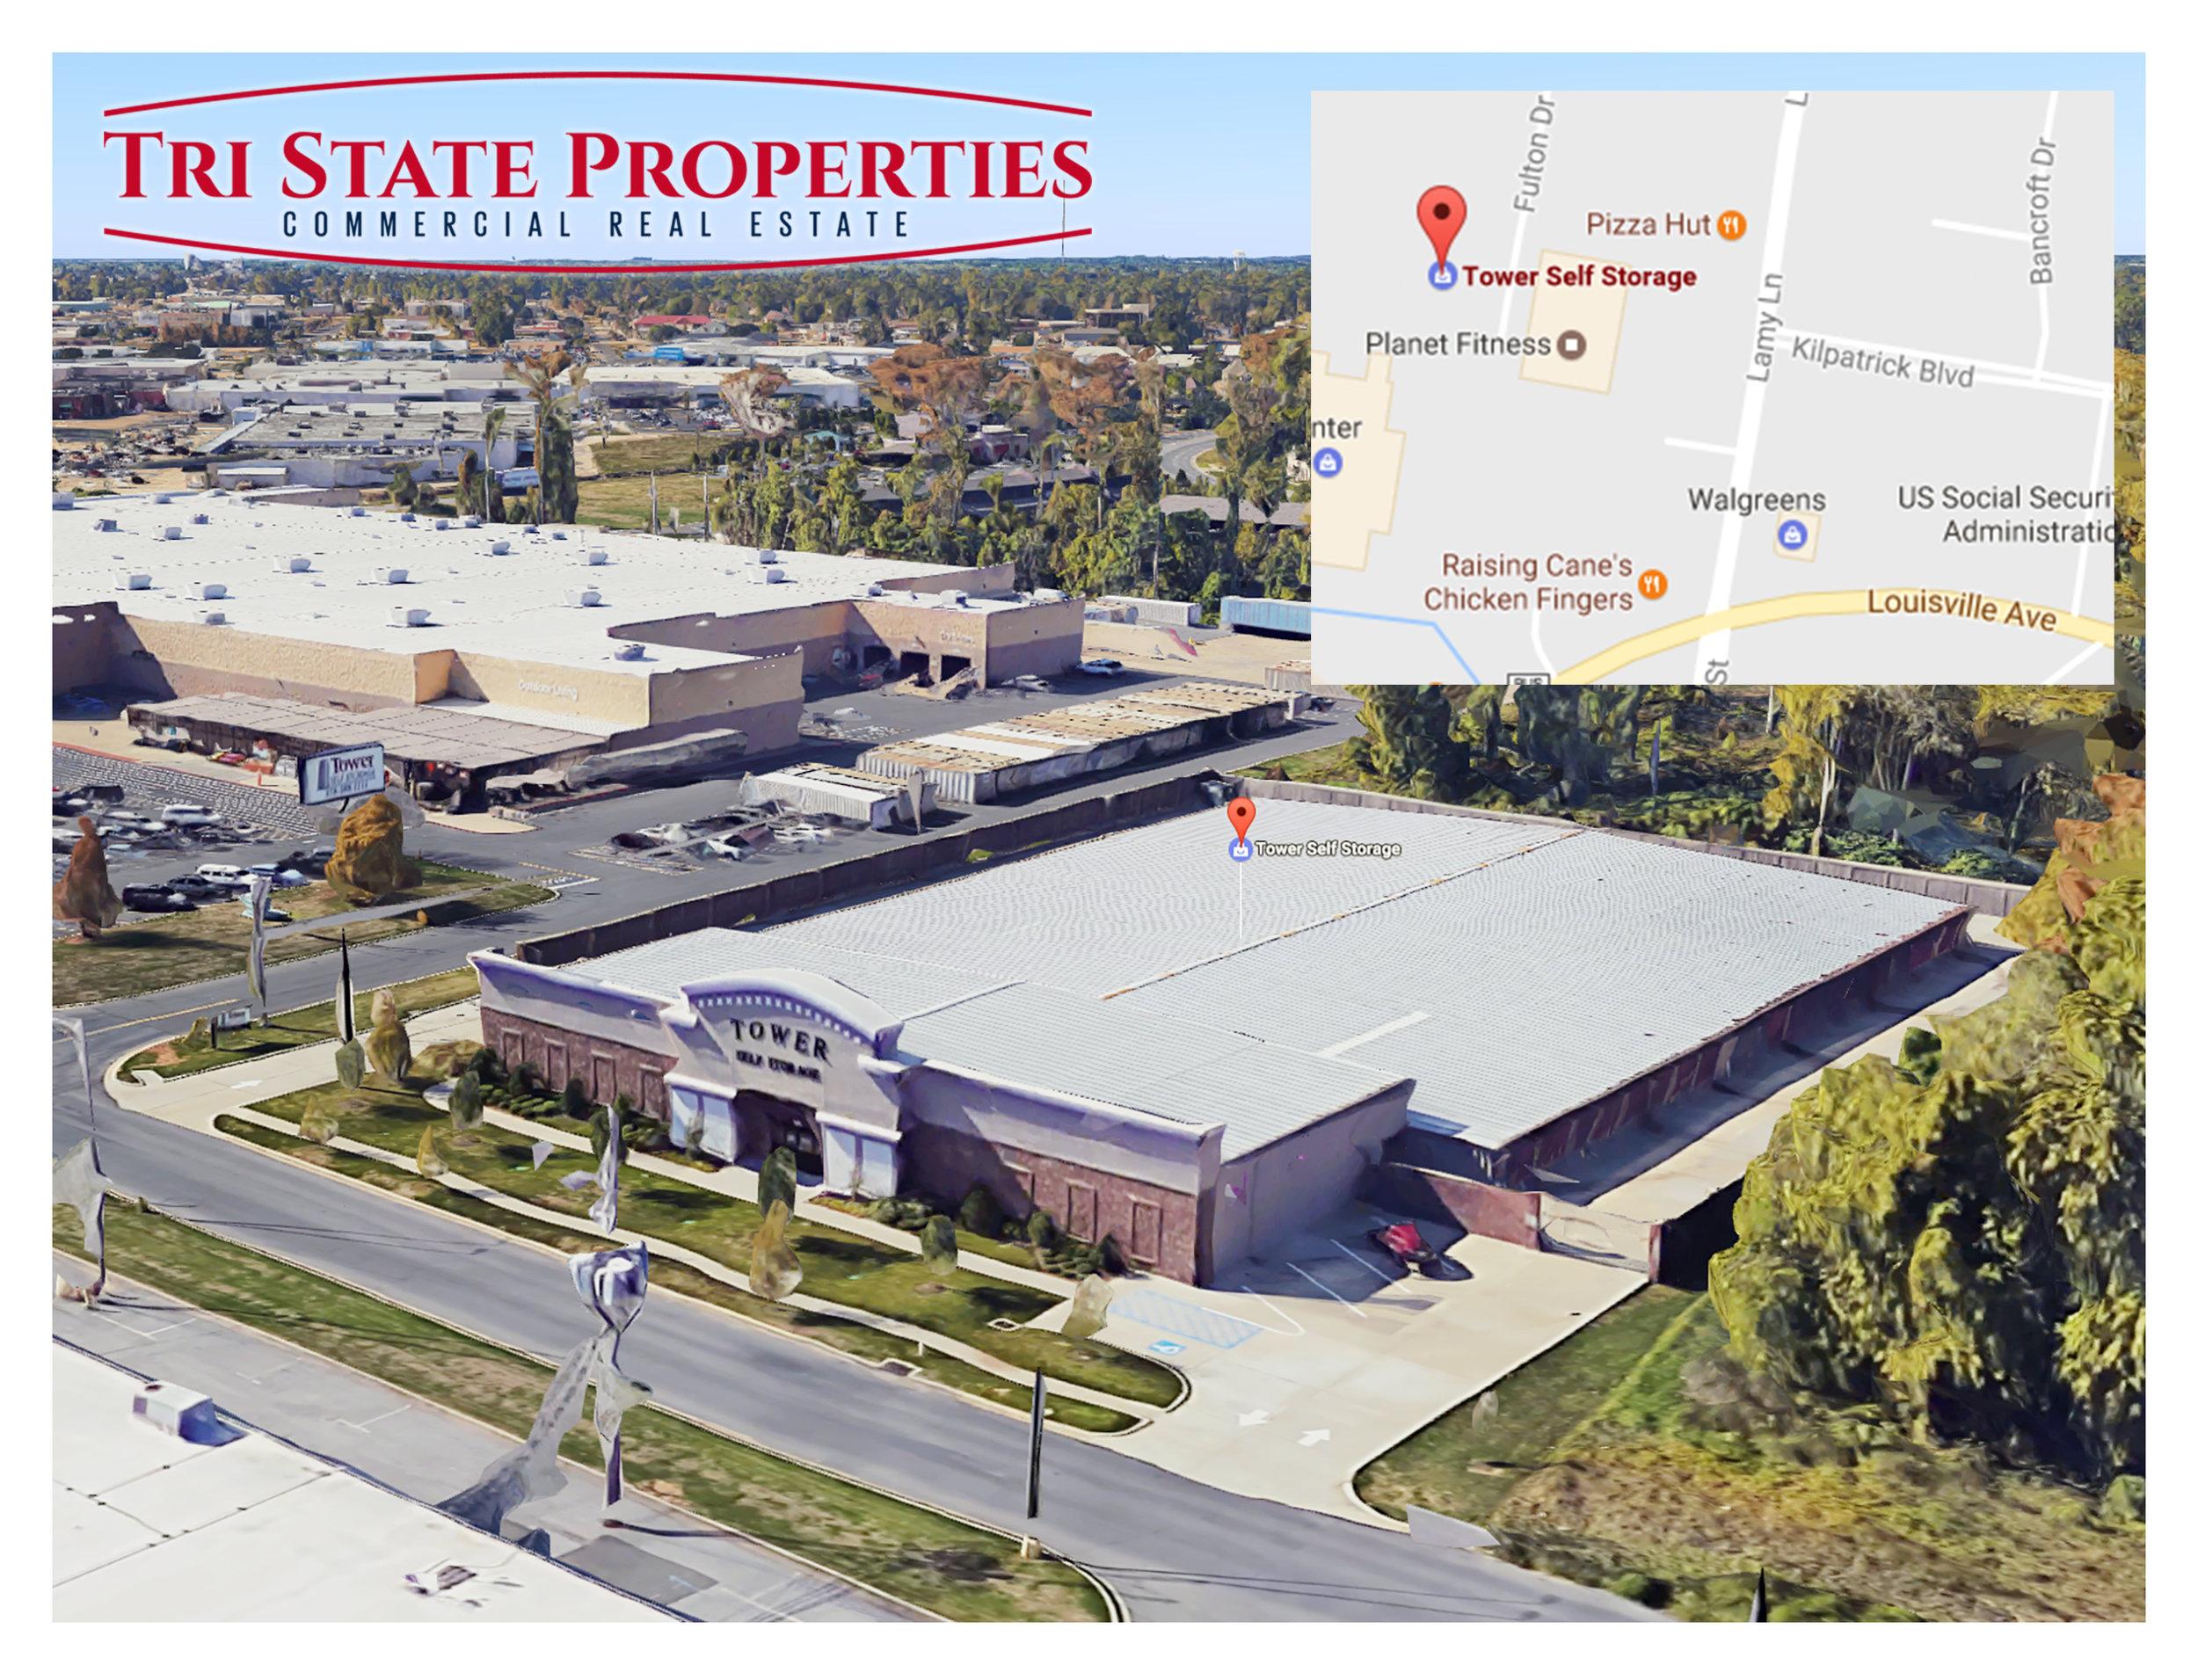 Motel 6 Monroe Commerical Real Estate | Tri State Properties | Ryan Roark